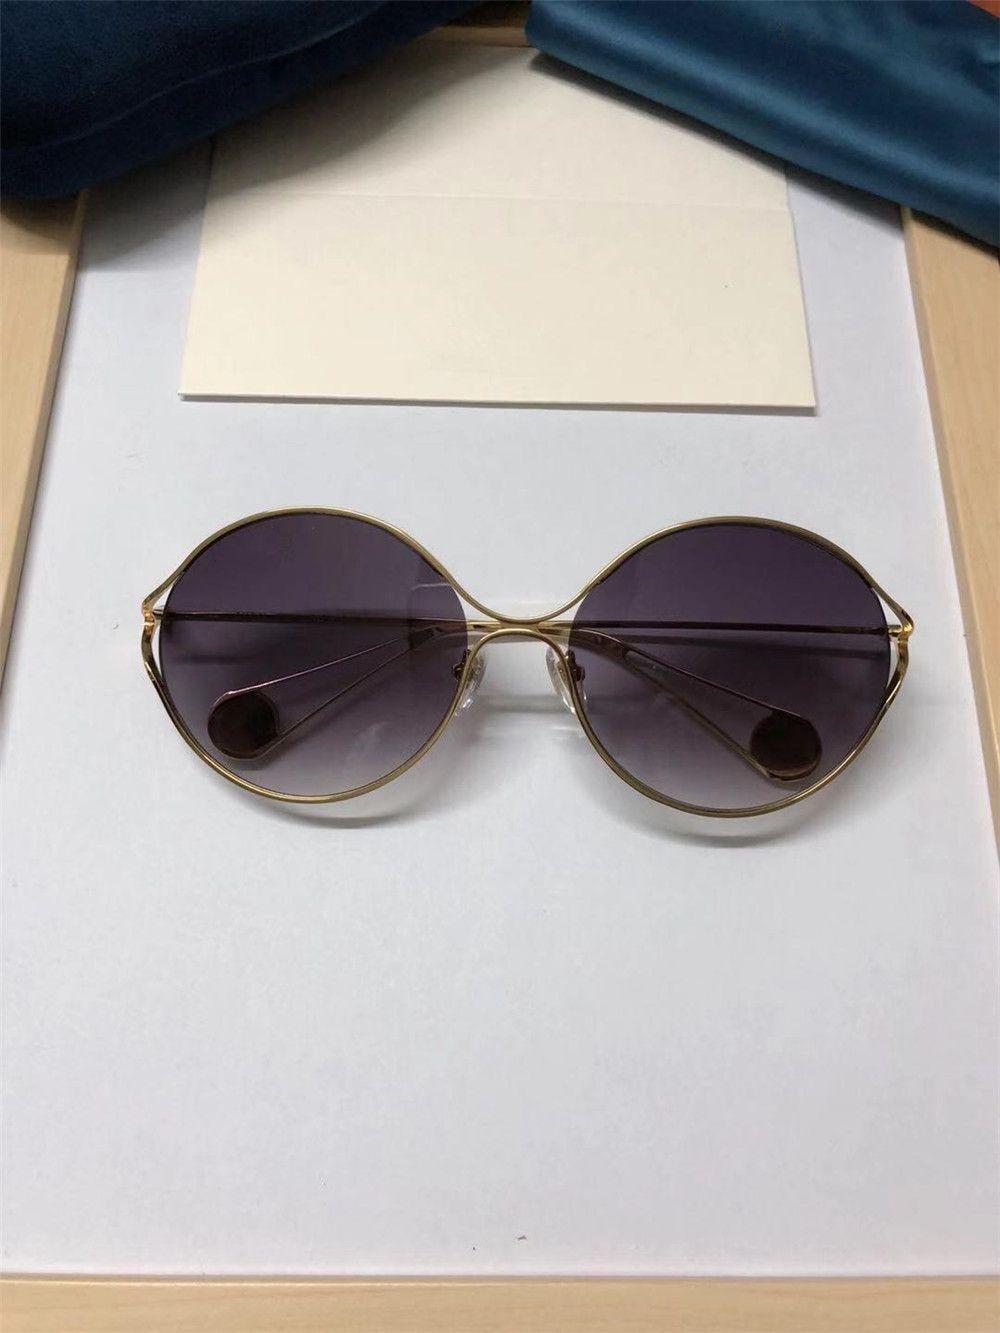 d0ef6c2f57 2019 Vinatge Round Sunglasses Luxury Women Brand Designer Full Frame Pearls  Glasses High Quality UV Protection Gradient Eyewear With Package Eyeglasses  ...